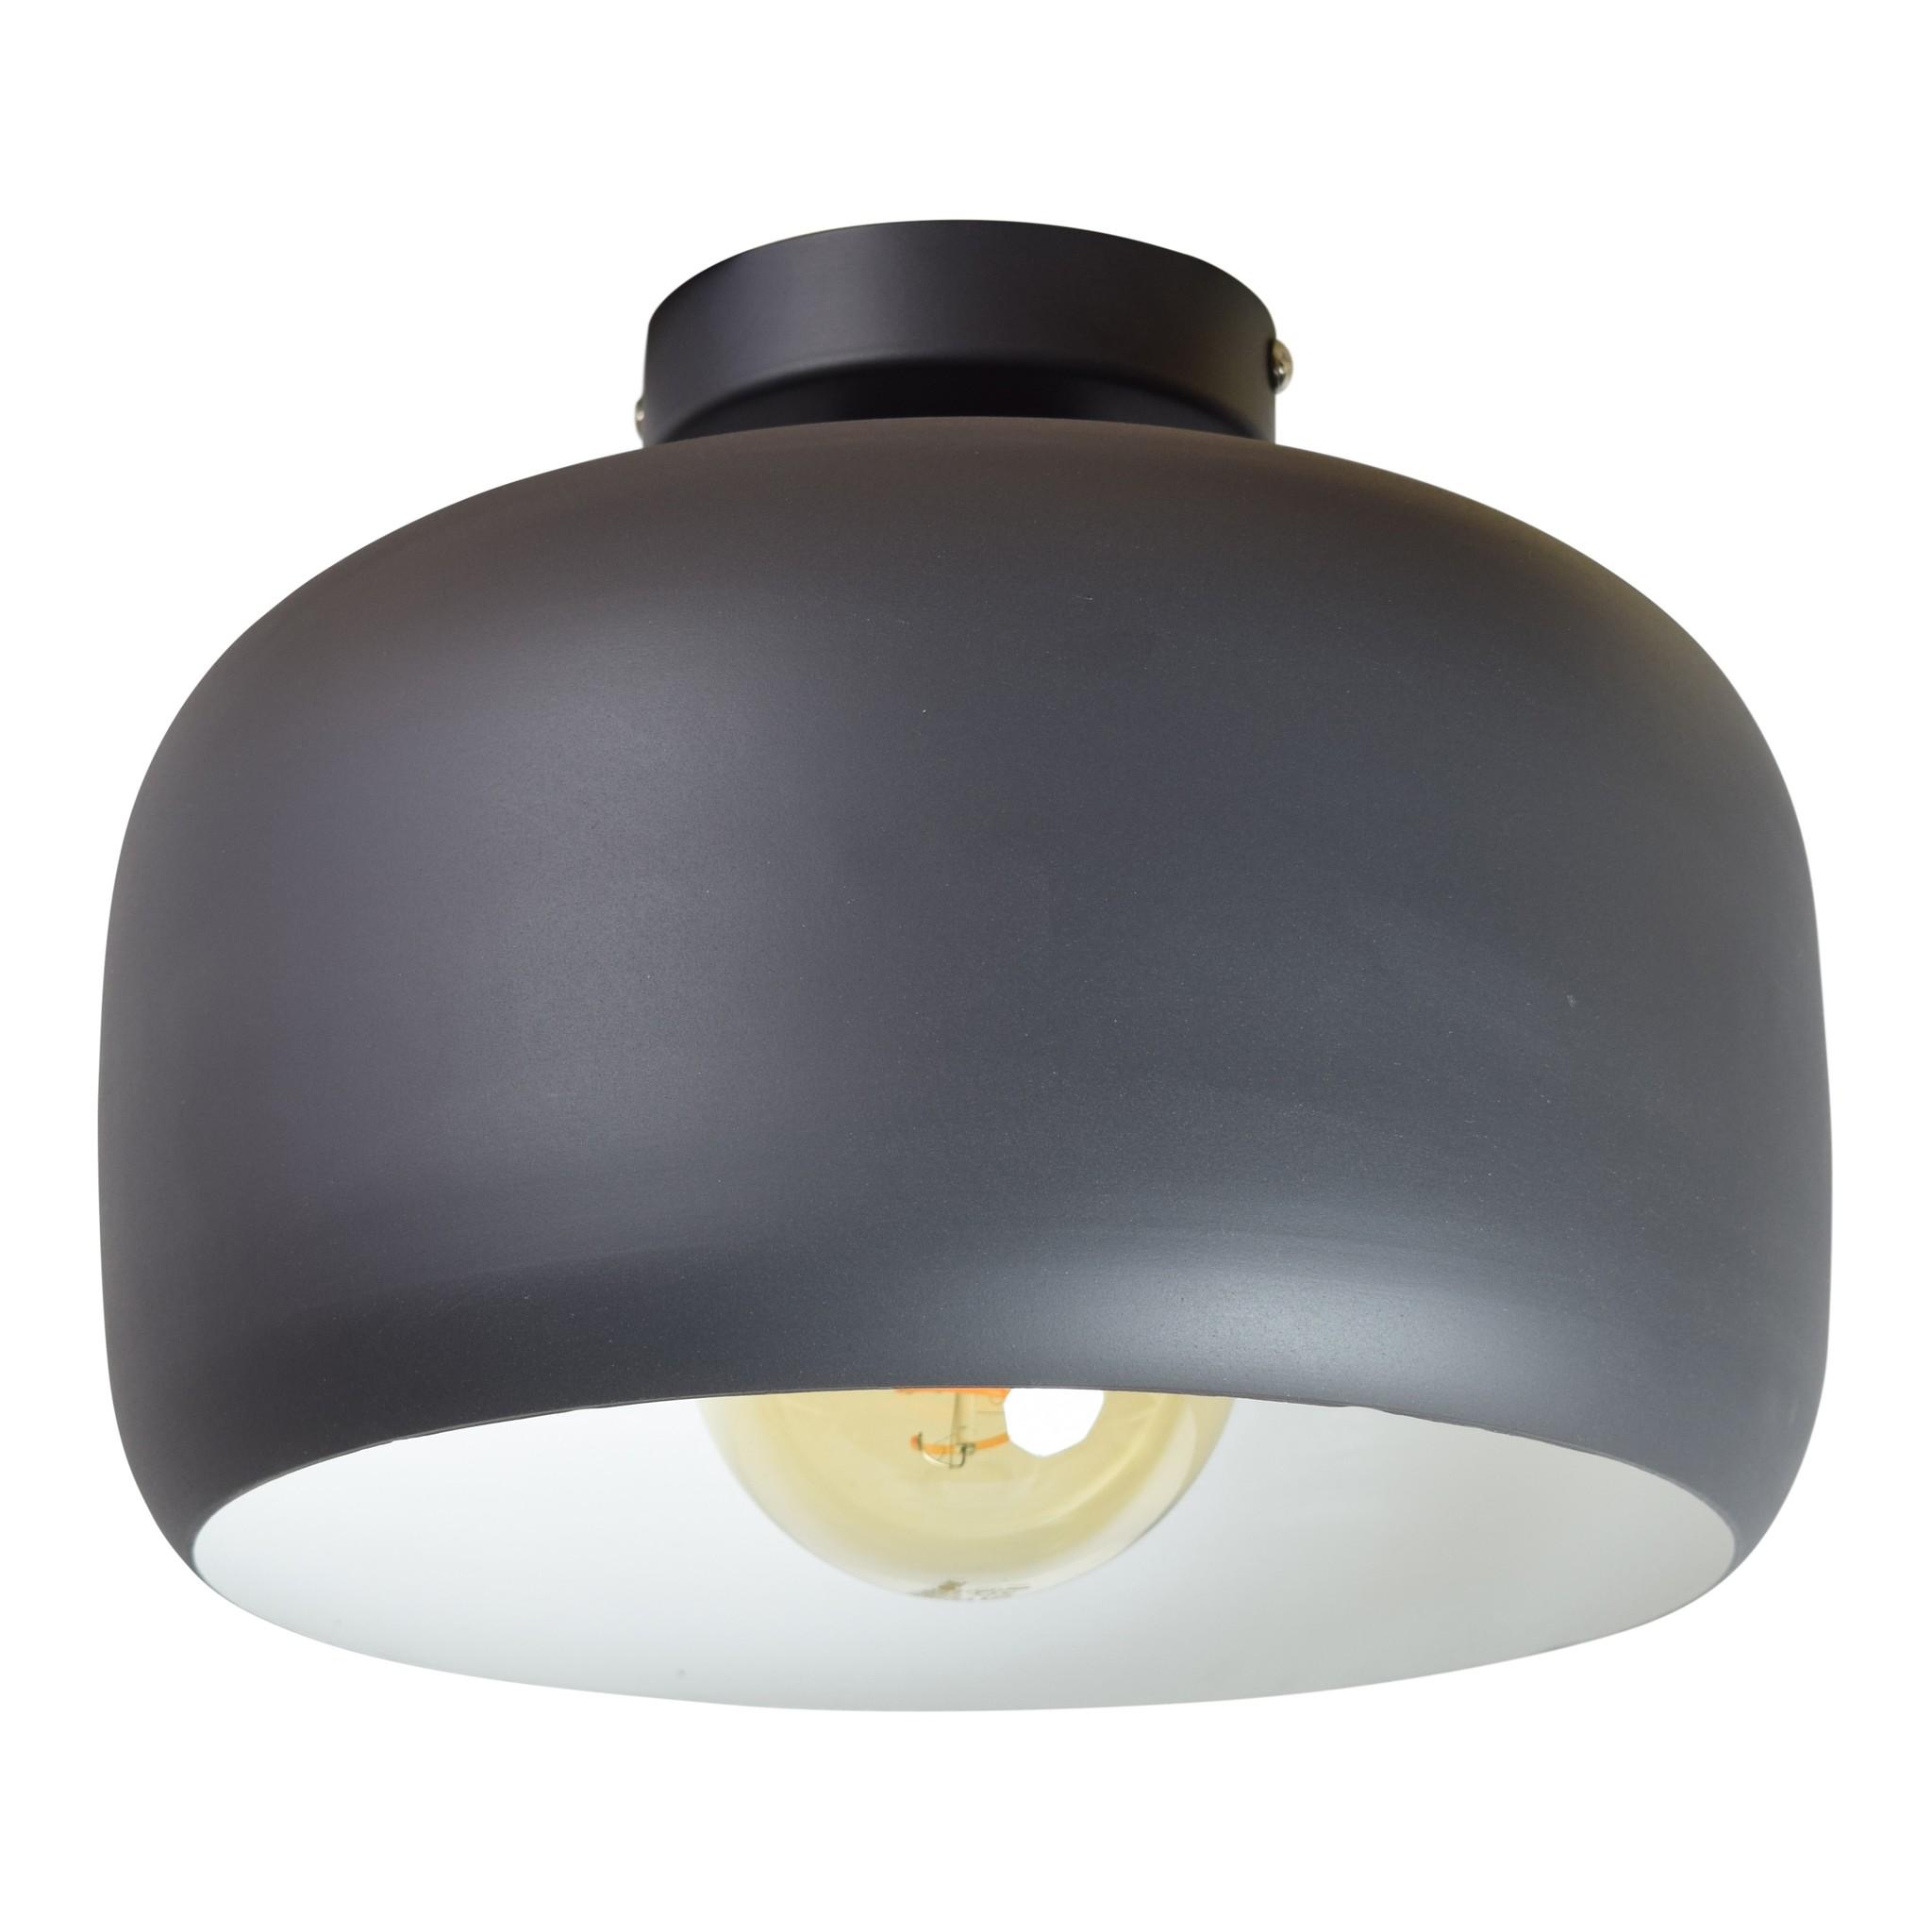 Urban Interiors Urban Interiors Plafondlamp Ivy ø30x22 vintage black-13012-8719325467062